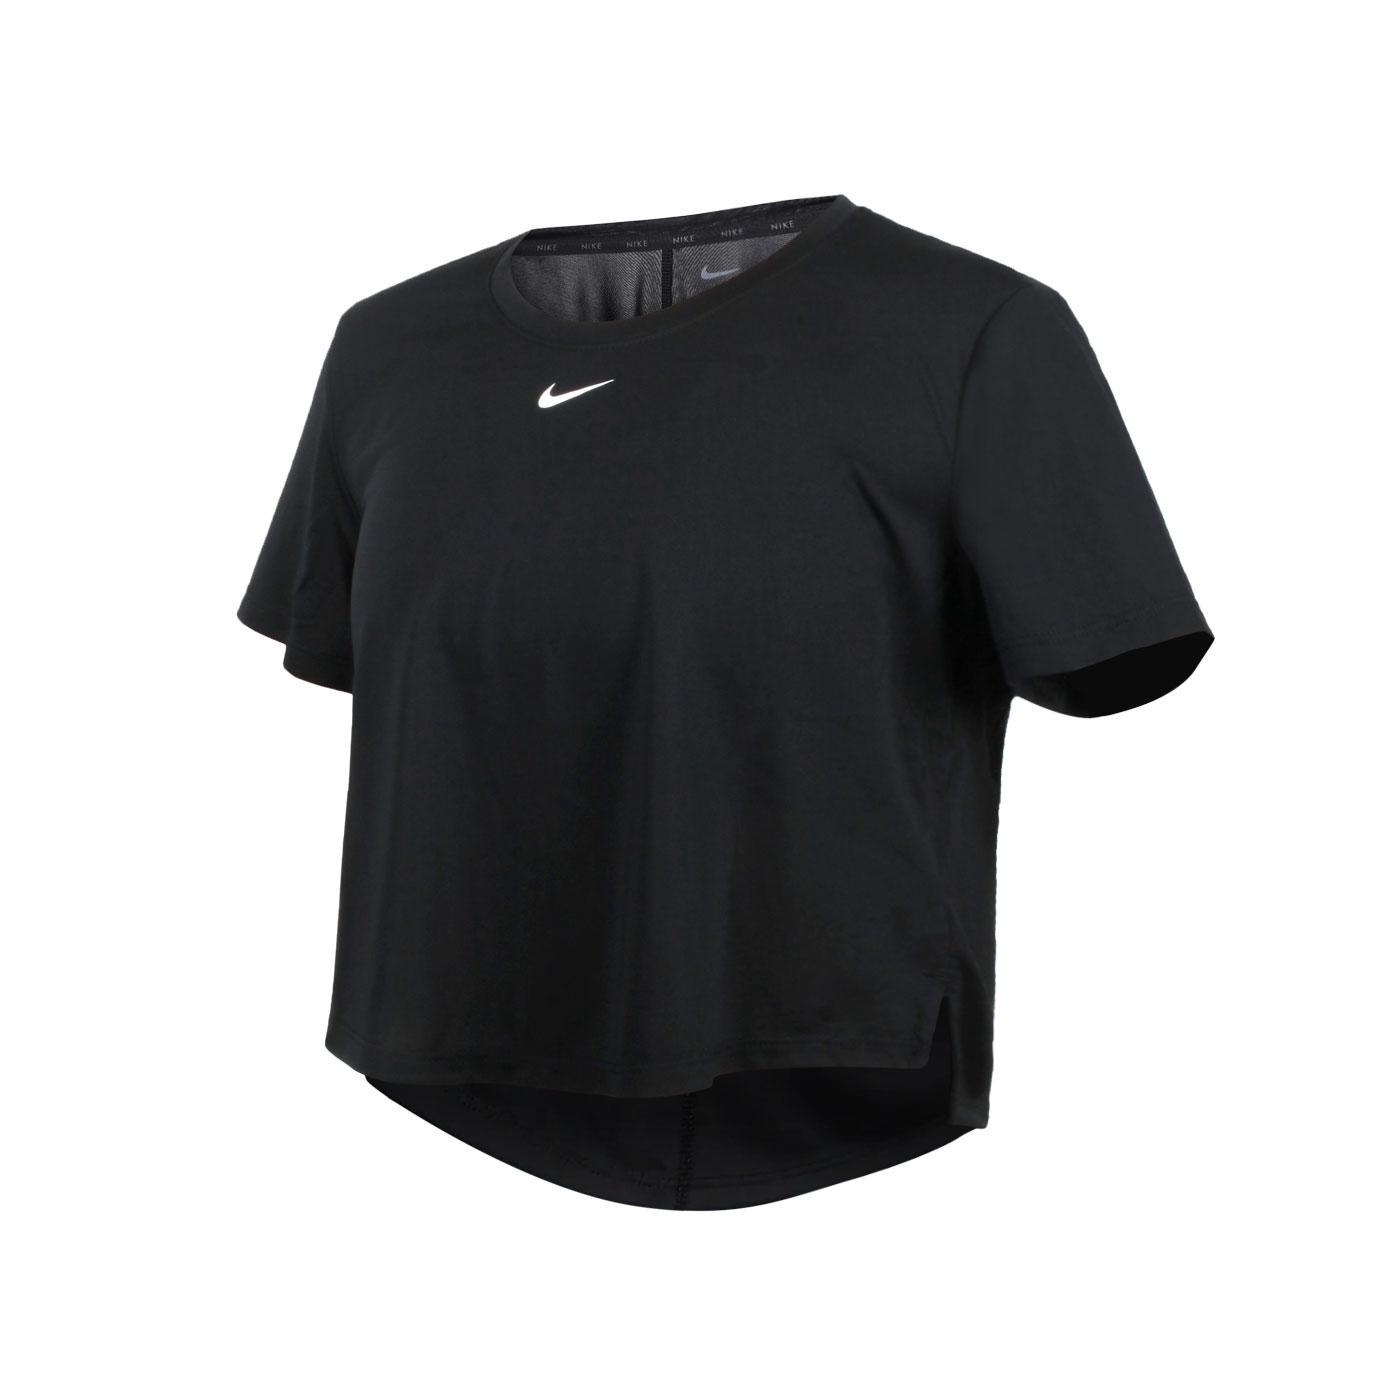 NIKE 女款短版短袖T恤 DD4955-010